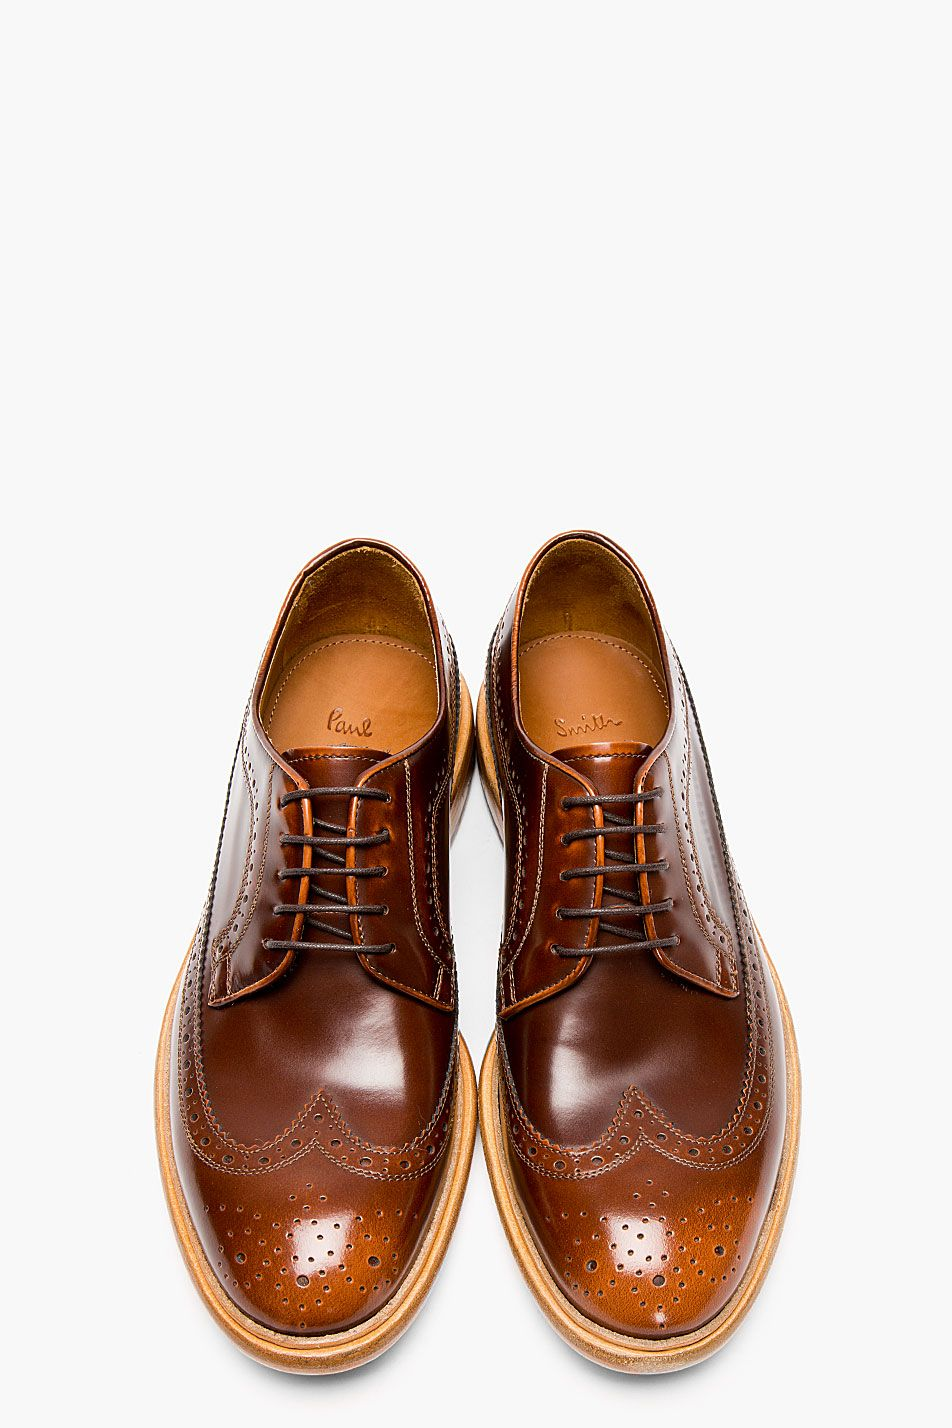 Paul Smith Men/'s Derby Shoes Senior Dark Tan